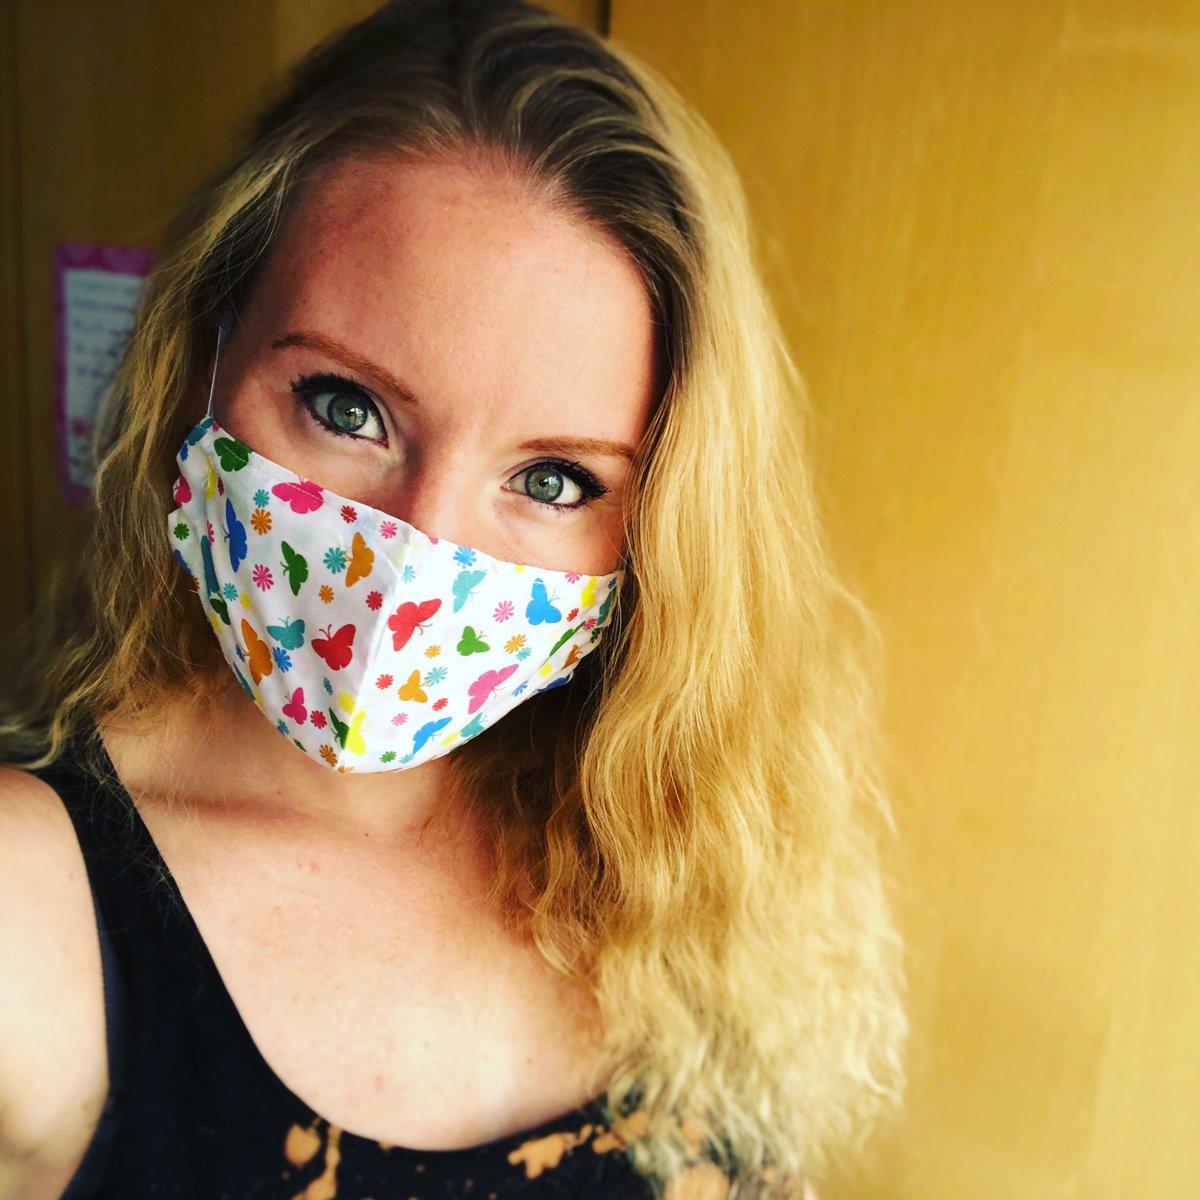 Off delivering masks for mummykins! Sporting my very own 🦋! x    #HandMadeMasks #ILoveButterflies #MaskDelivery #MyMumMakesMasks #CleverMummy https://t.co/SU8eMBar84